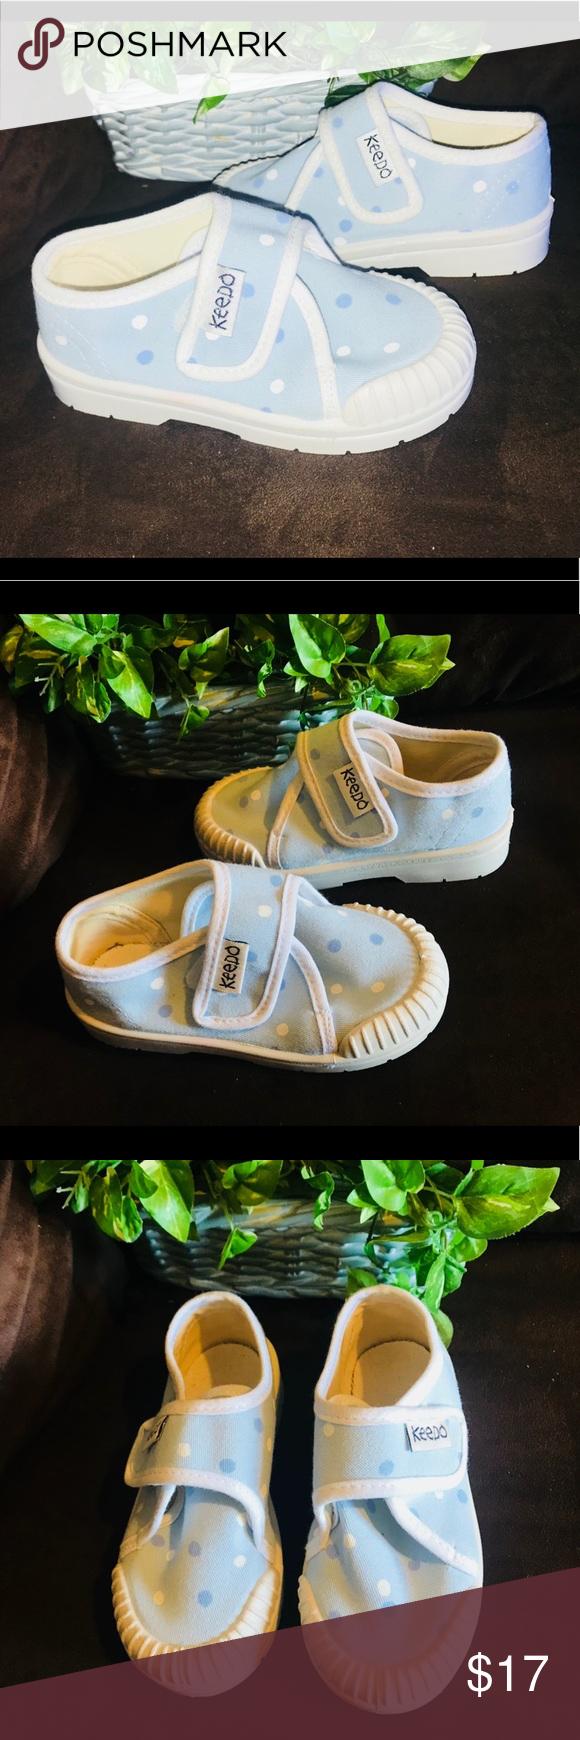 Keedo Shoes Sz7 in 2020 | Slip on